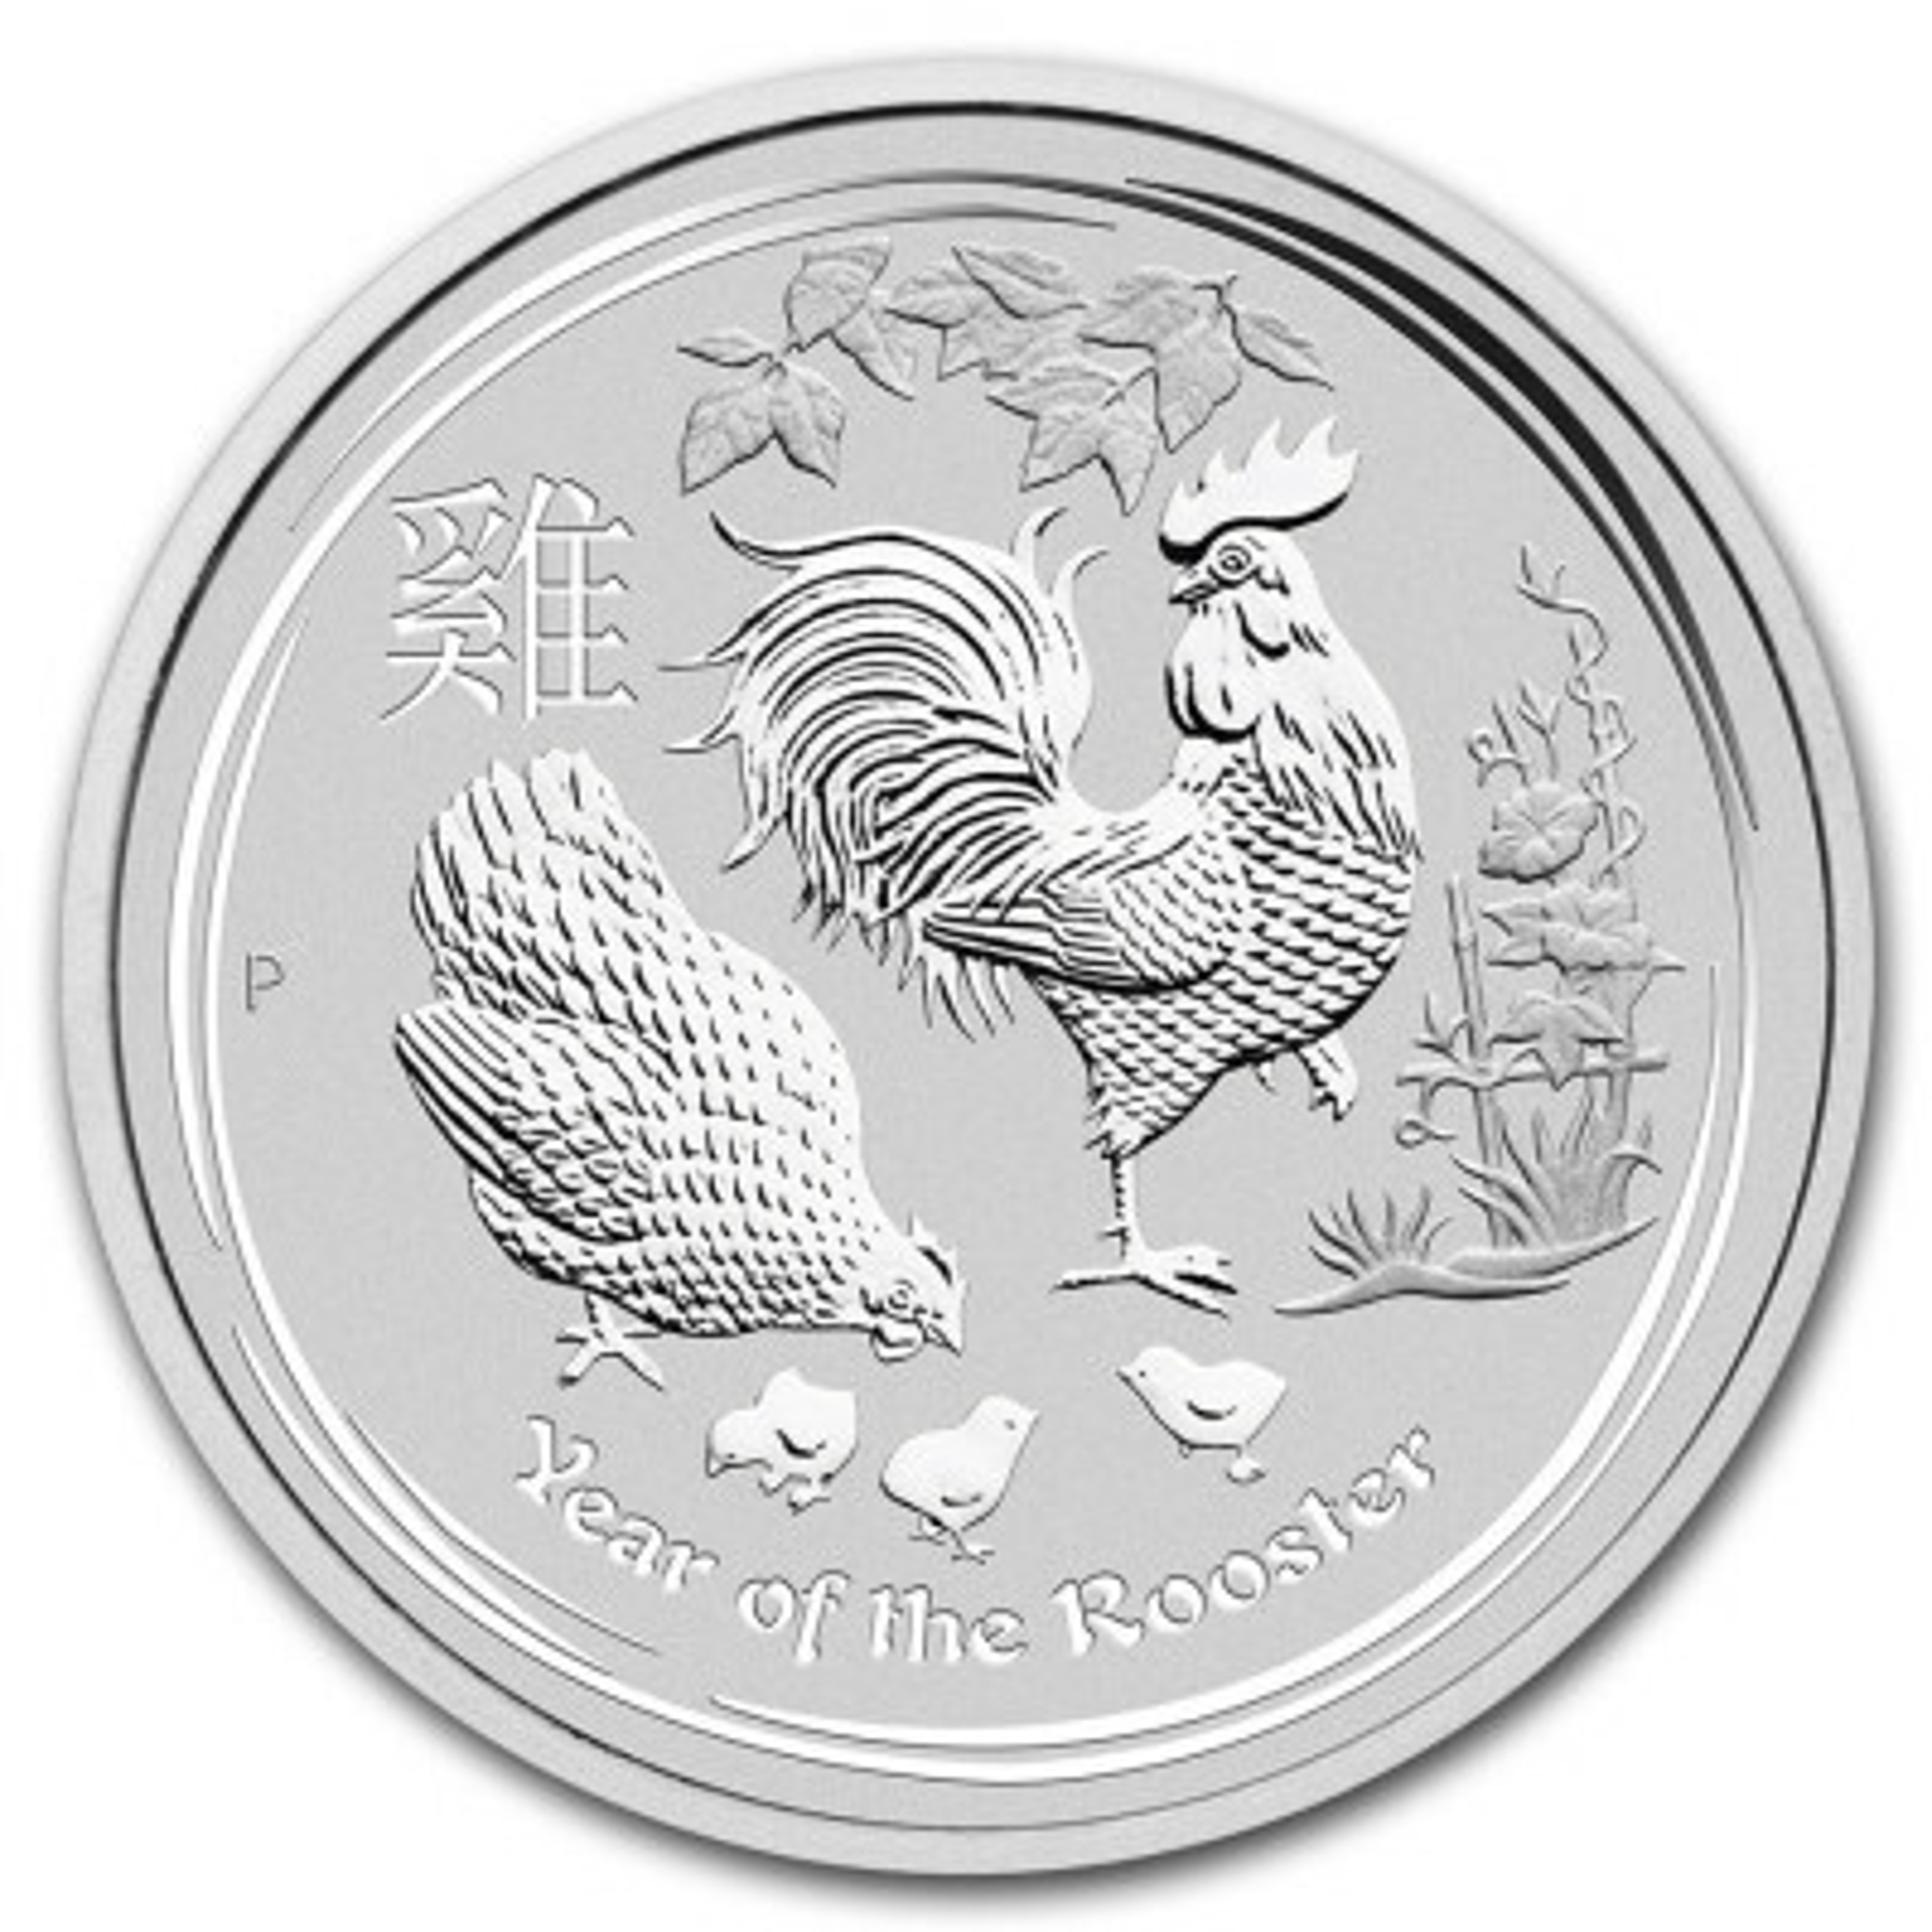 Silveren lunar coin 2017